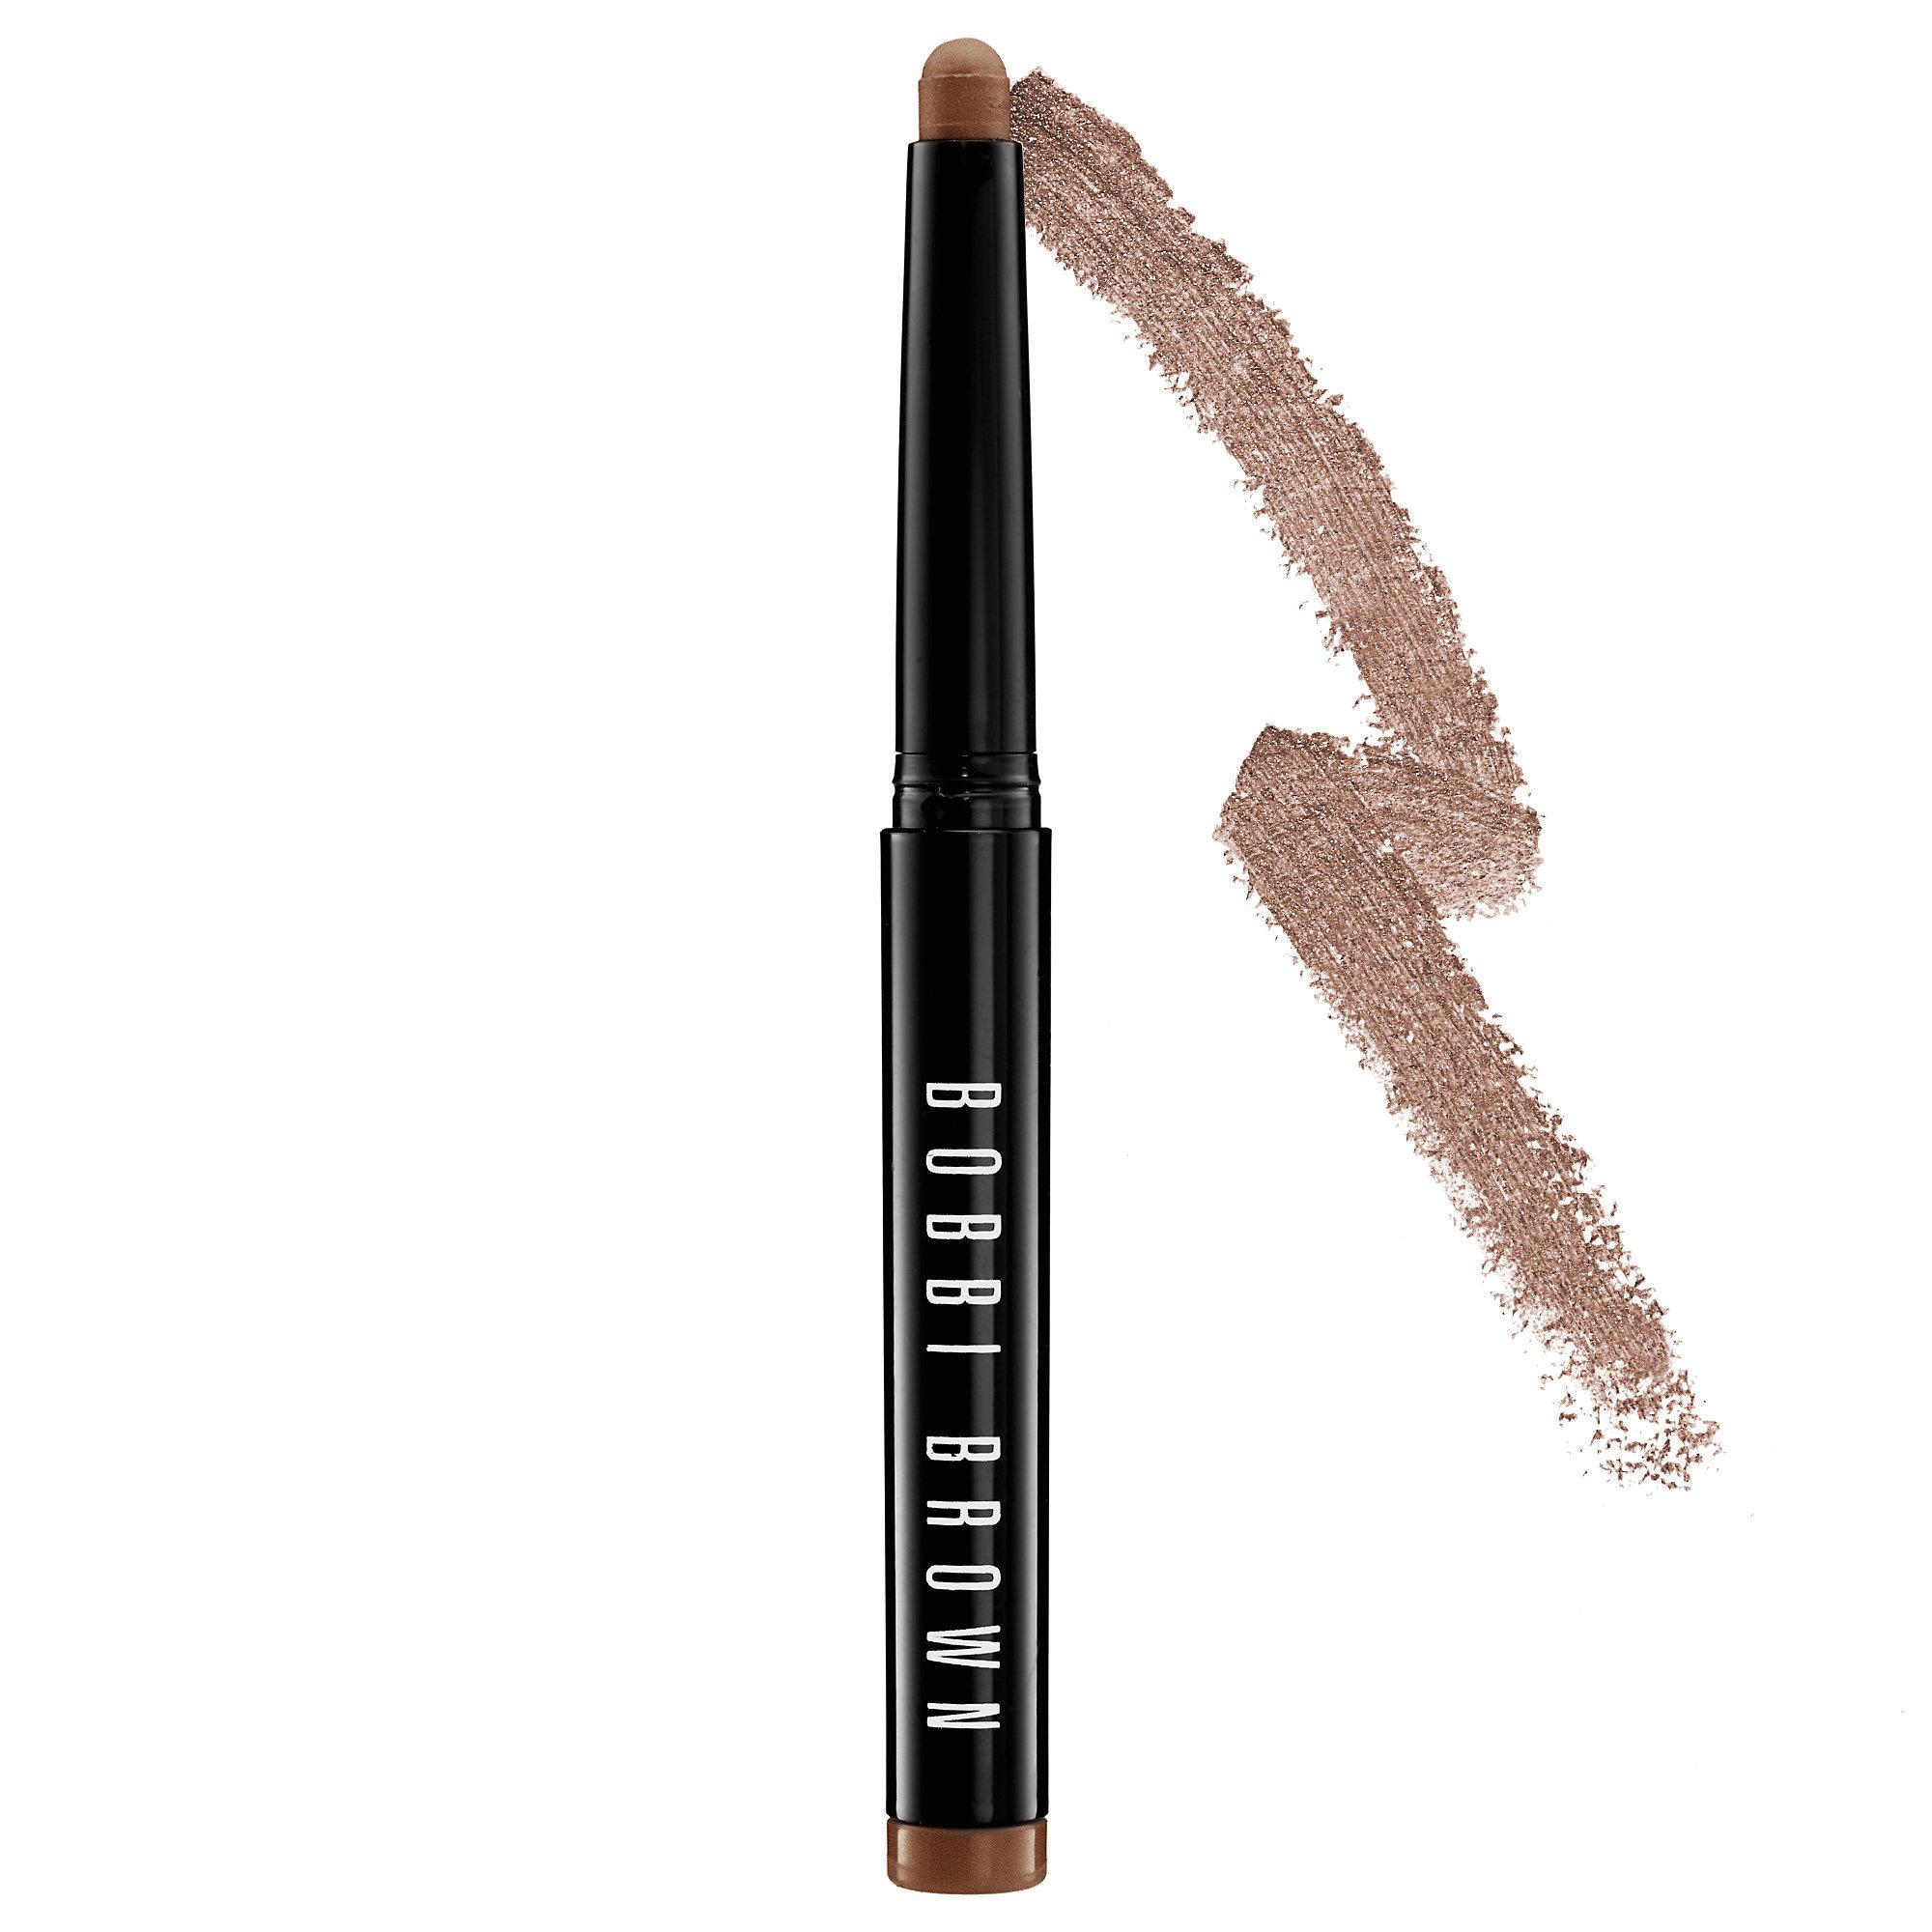 Bobbi Brown Long Wear Cream Shadow Stick Taupe